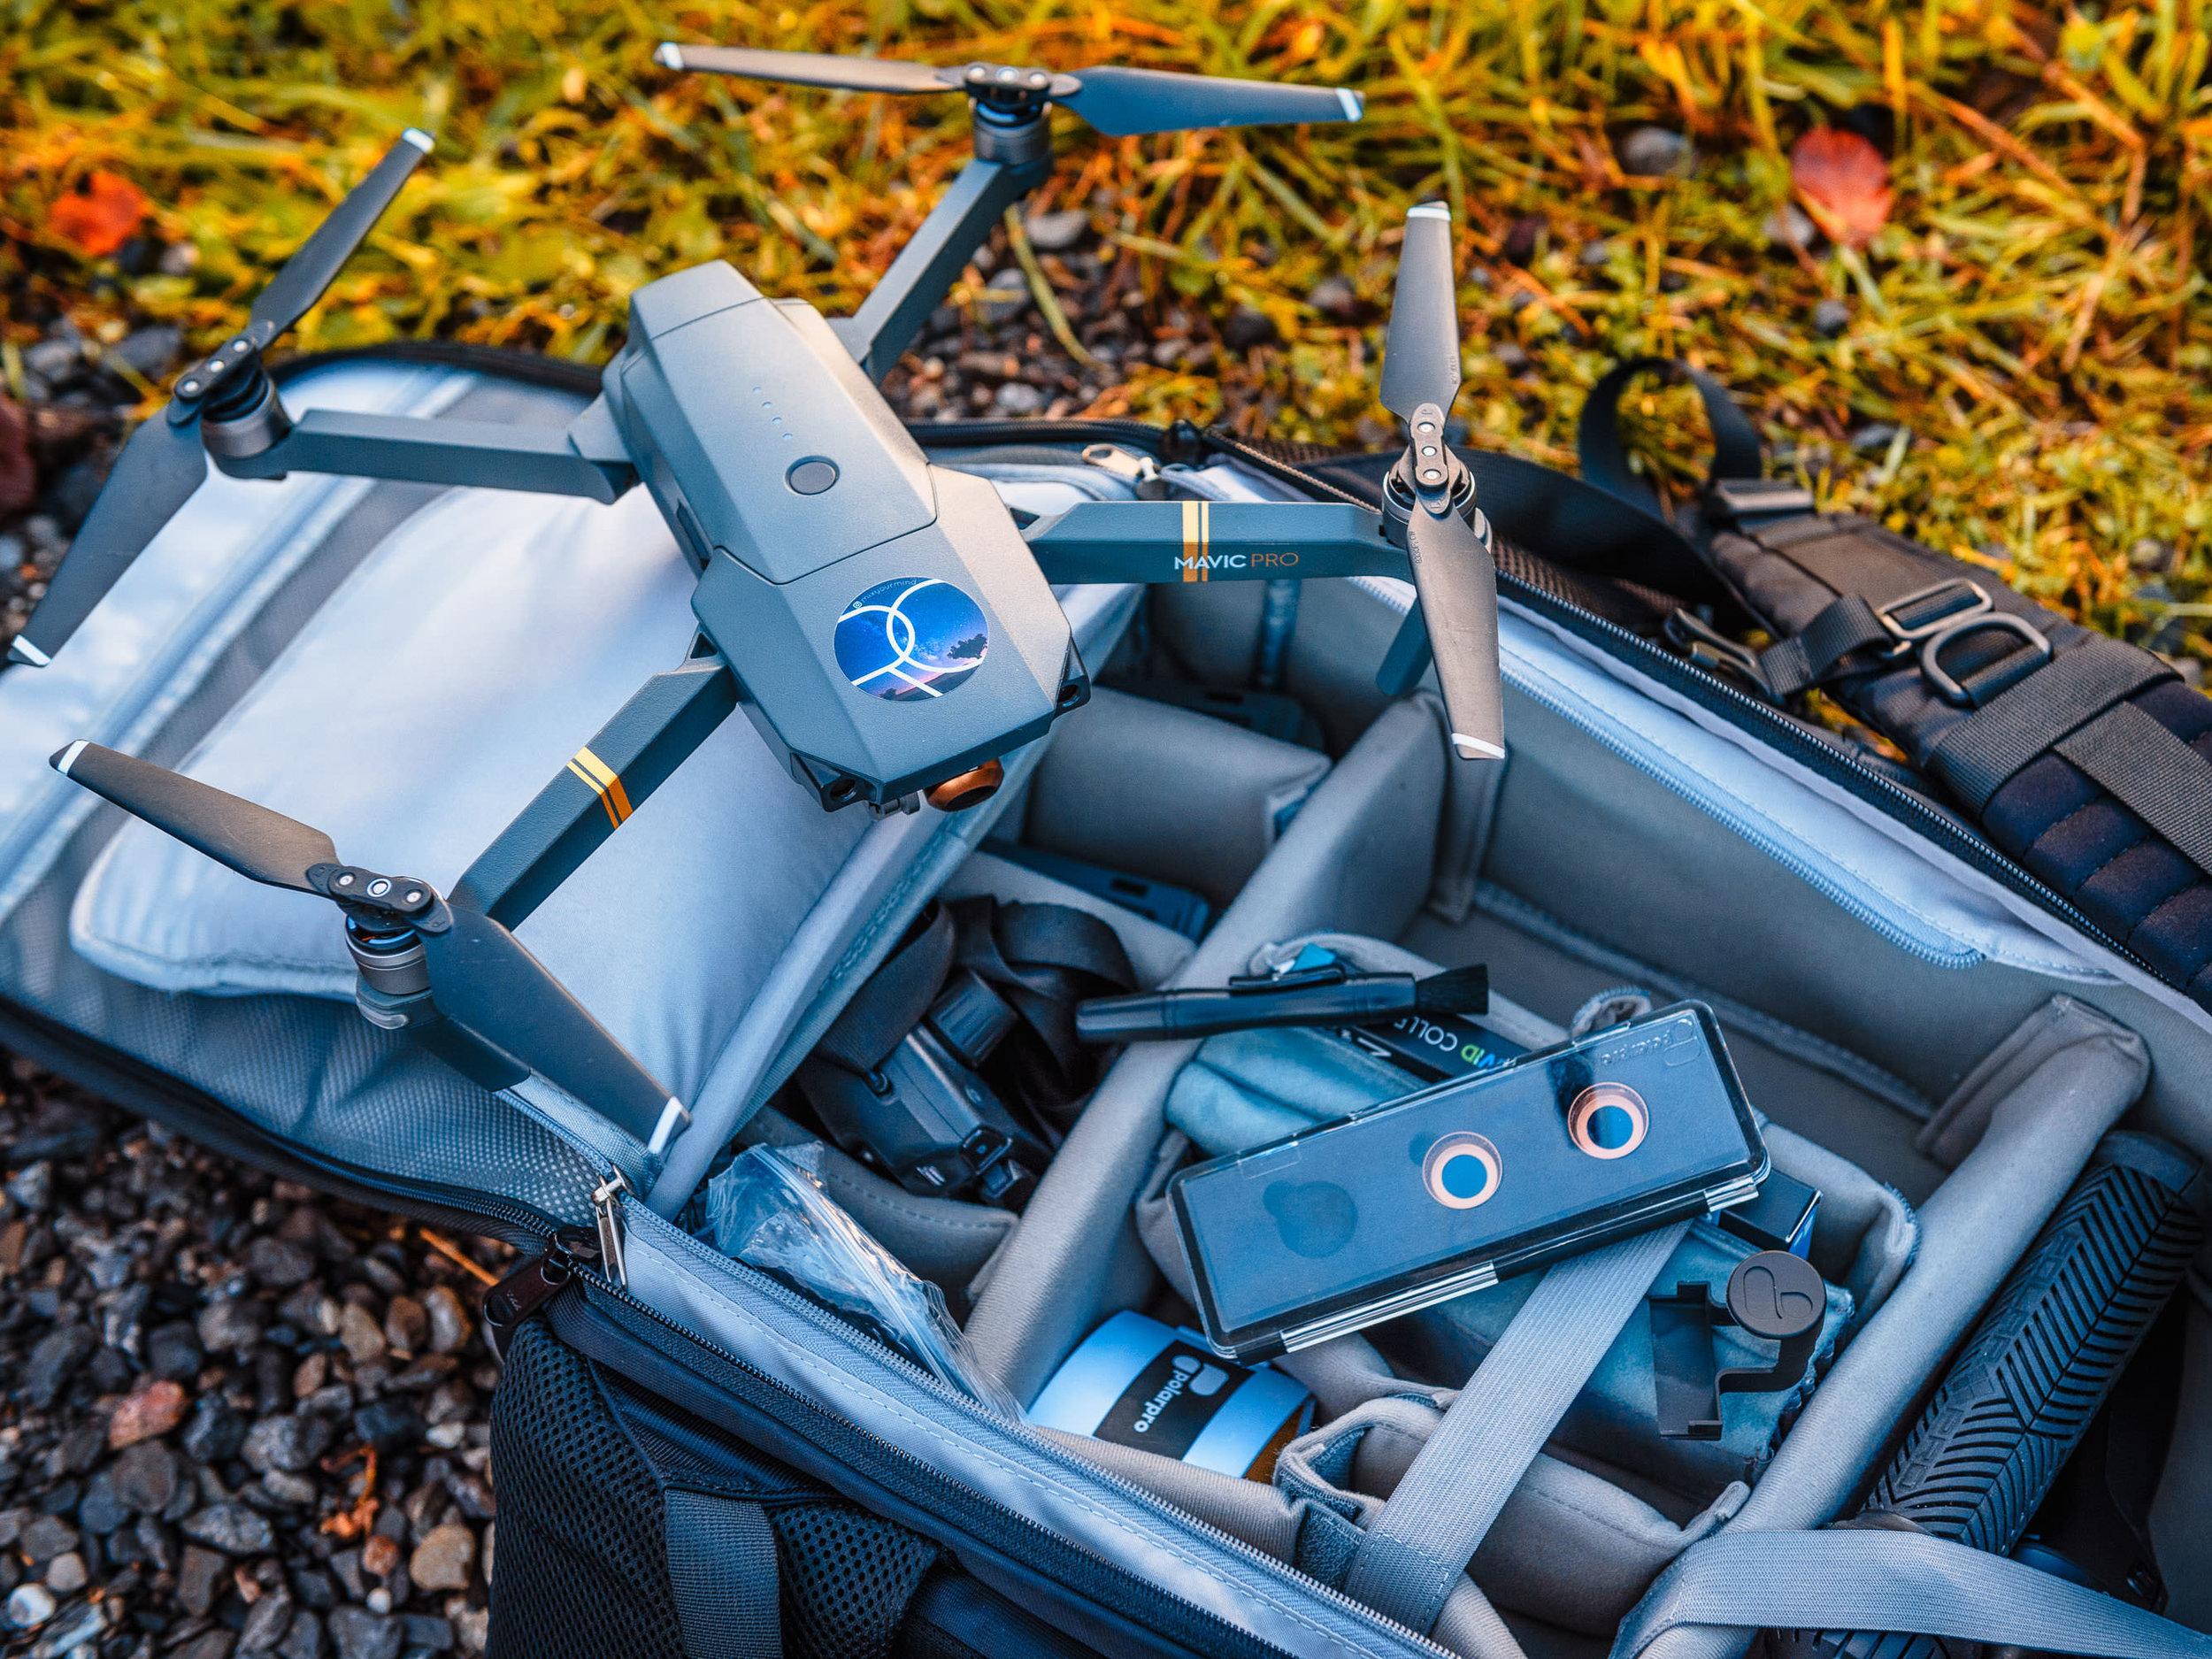 drone-photography-course-zurich.jpg